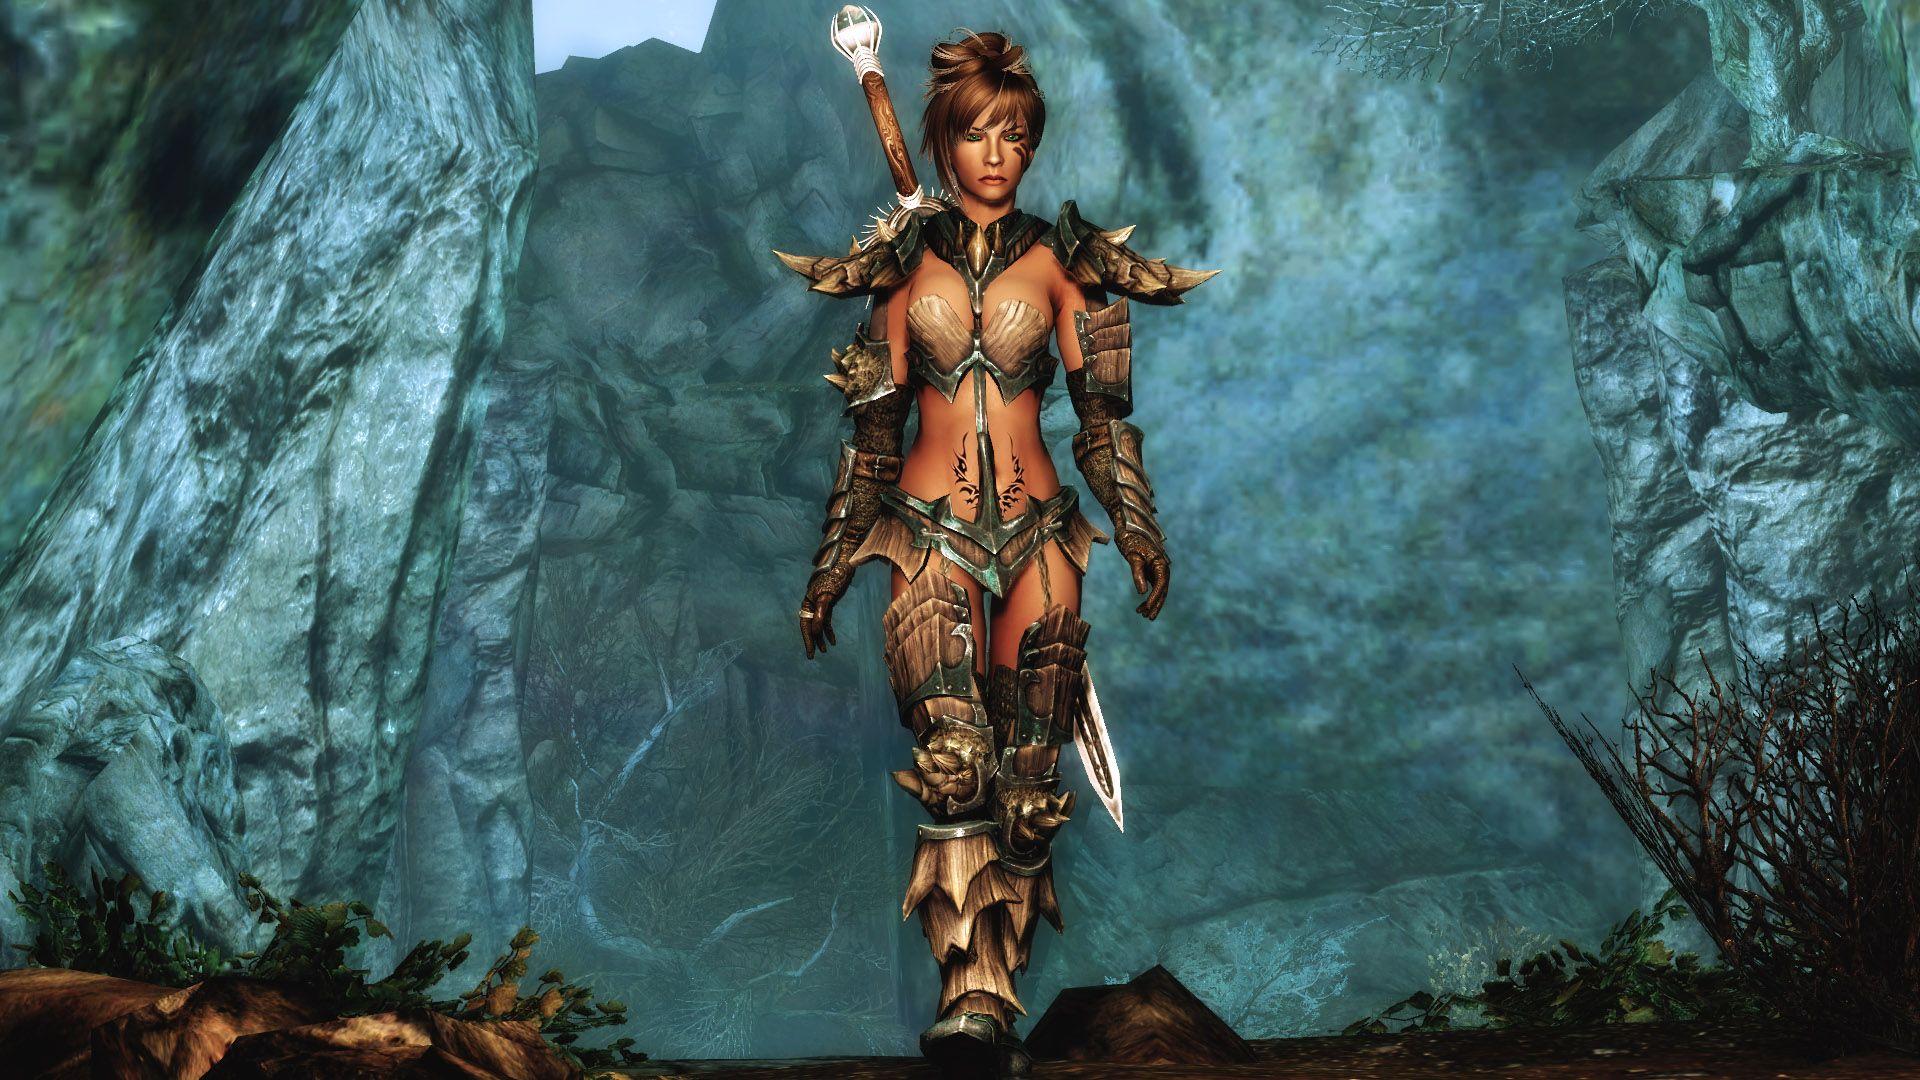 skyrim da.jpg - Elder Scrolls 5: Skyrim, the